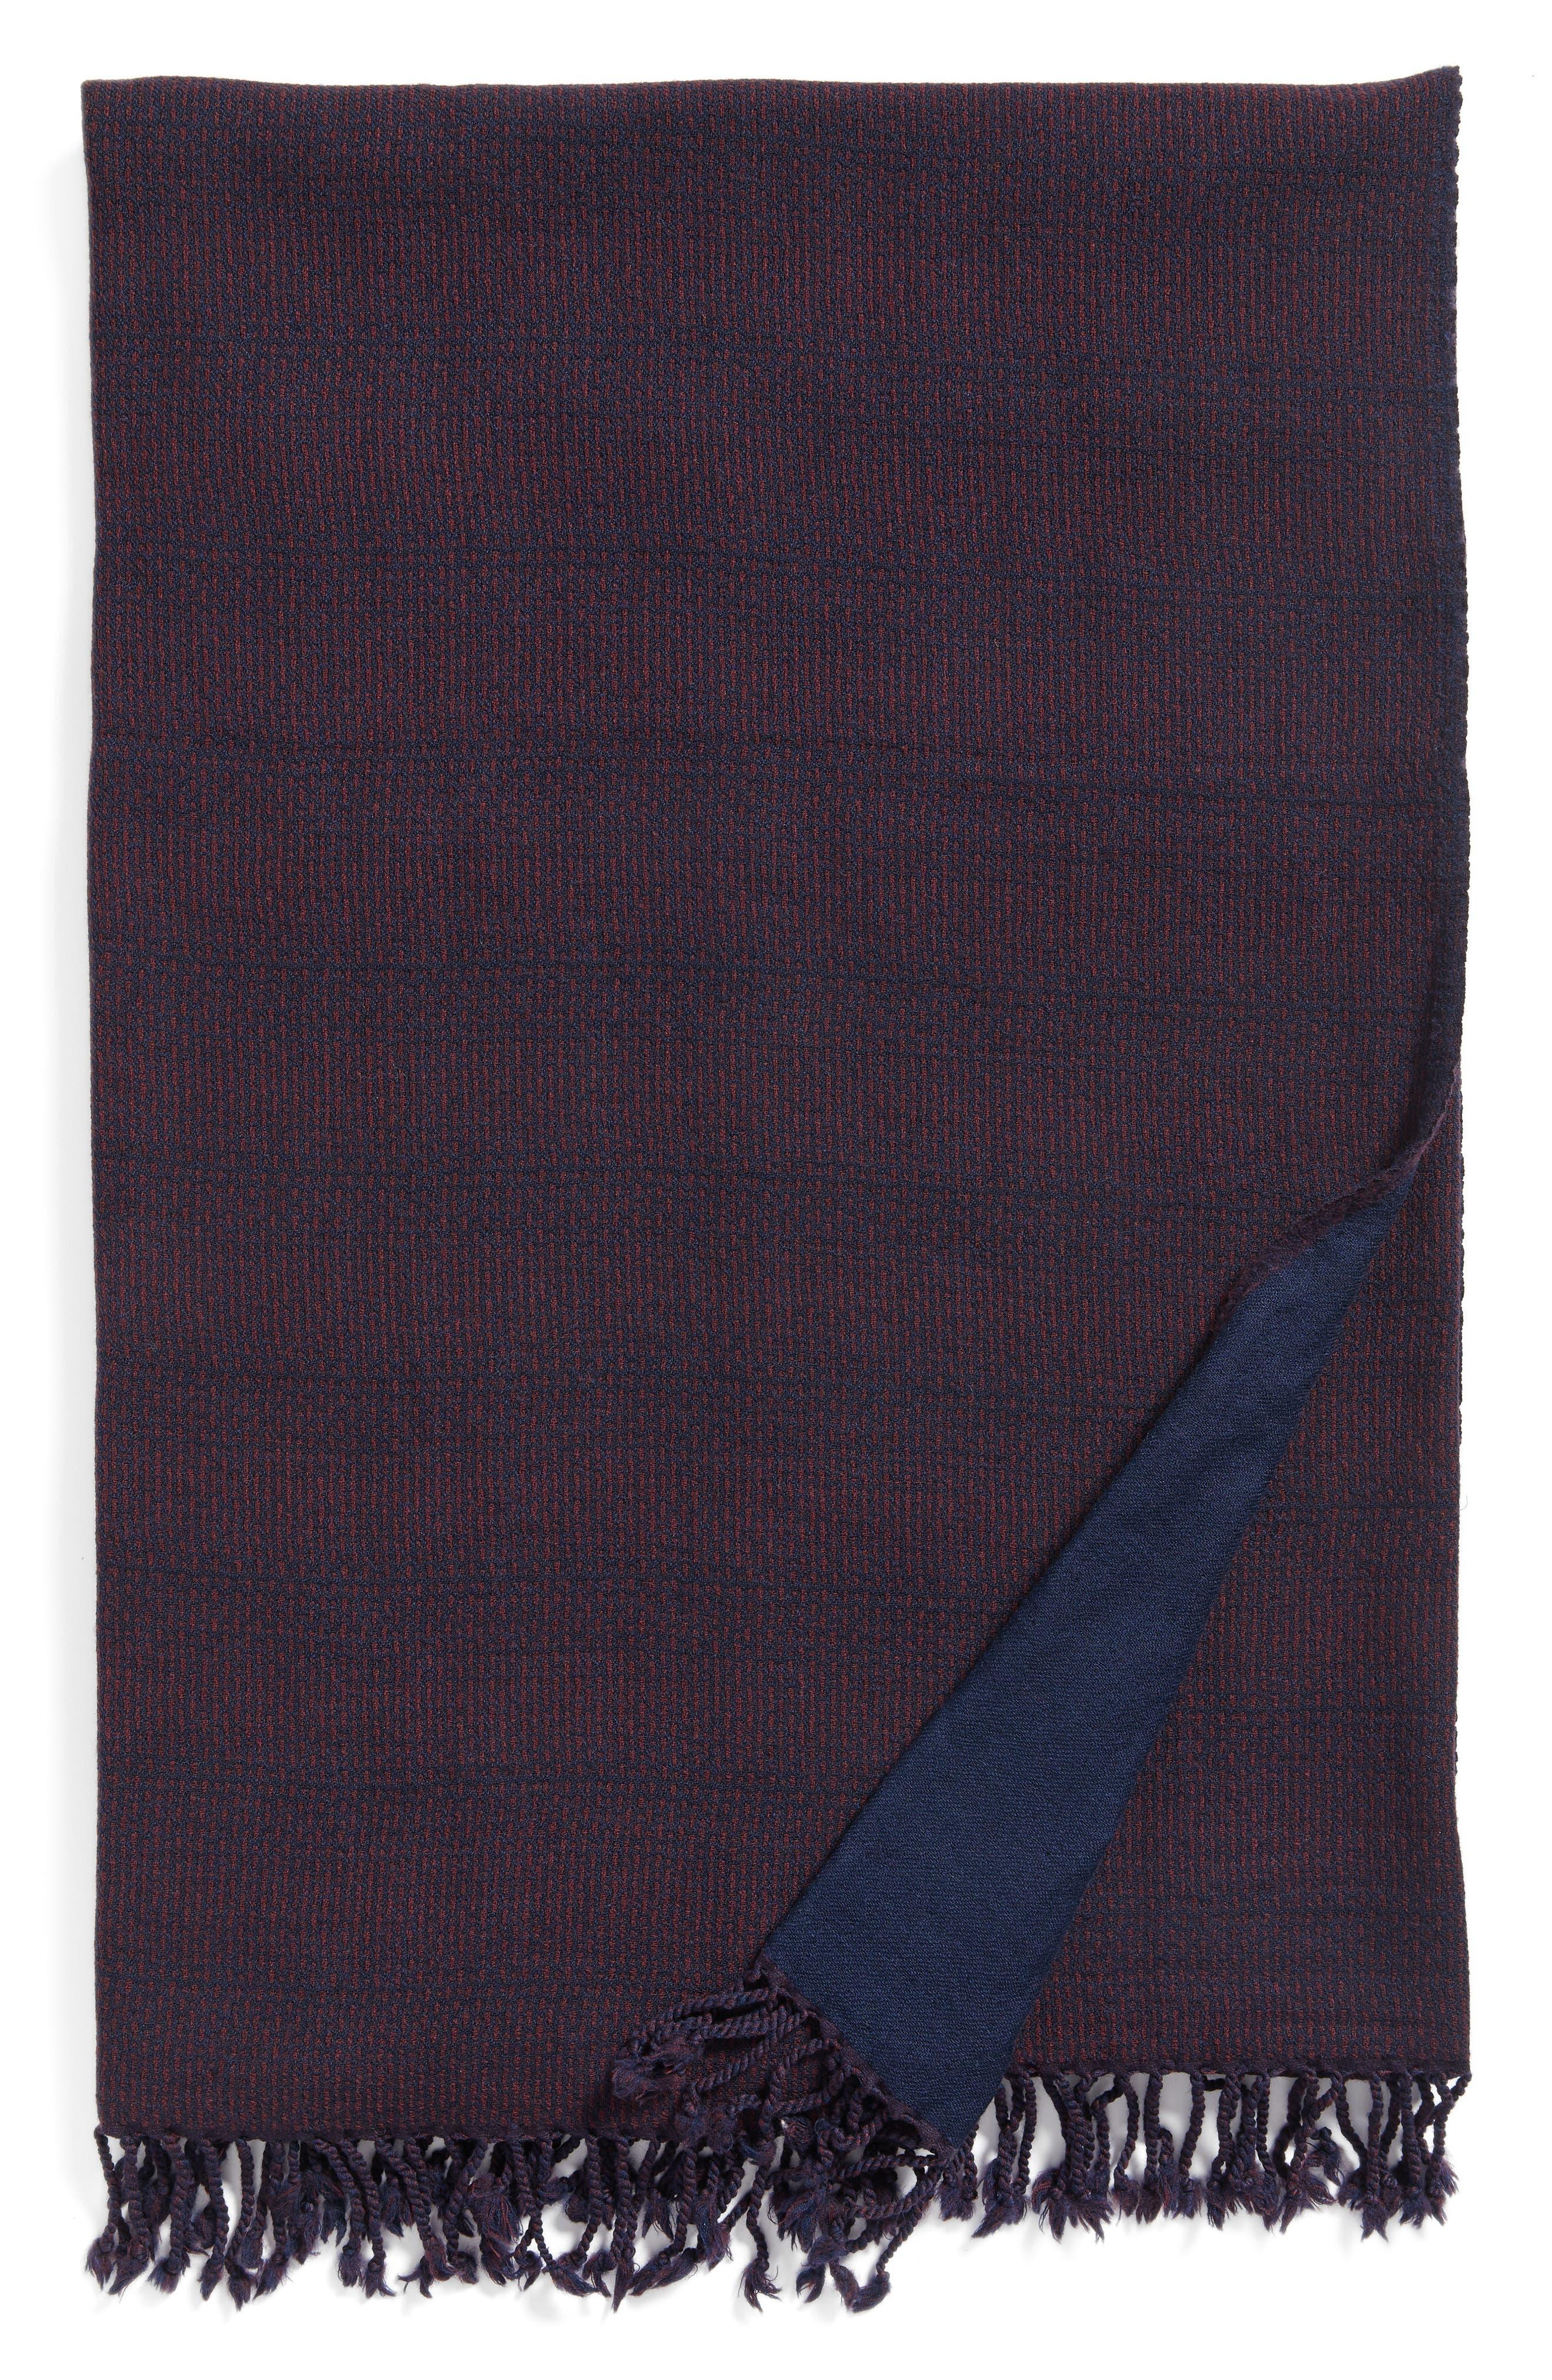 Alternate Image 1 Selected - Modern Staples Stipple Stripe Double Face Merino Wool Throw